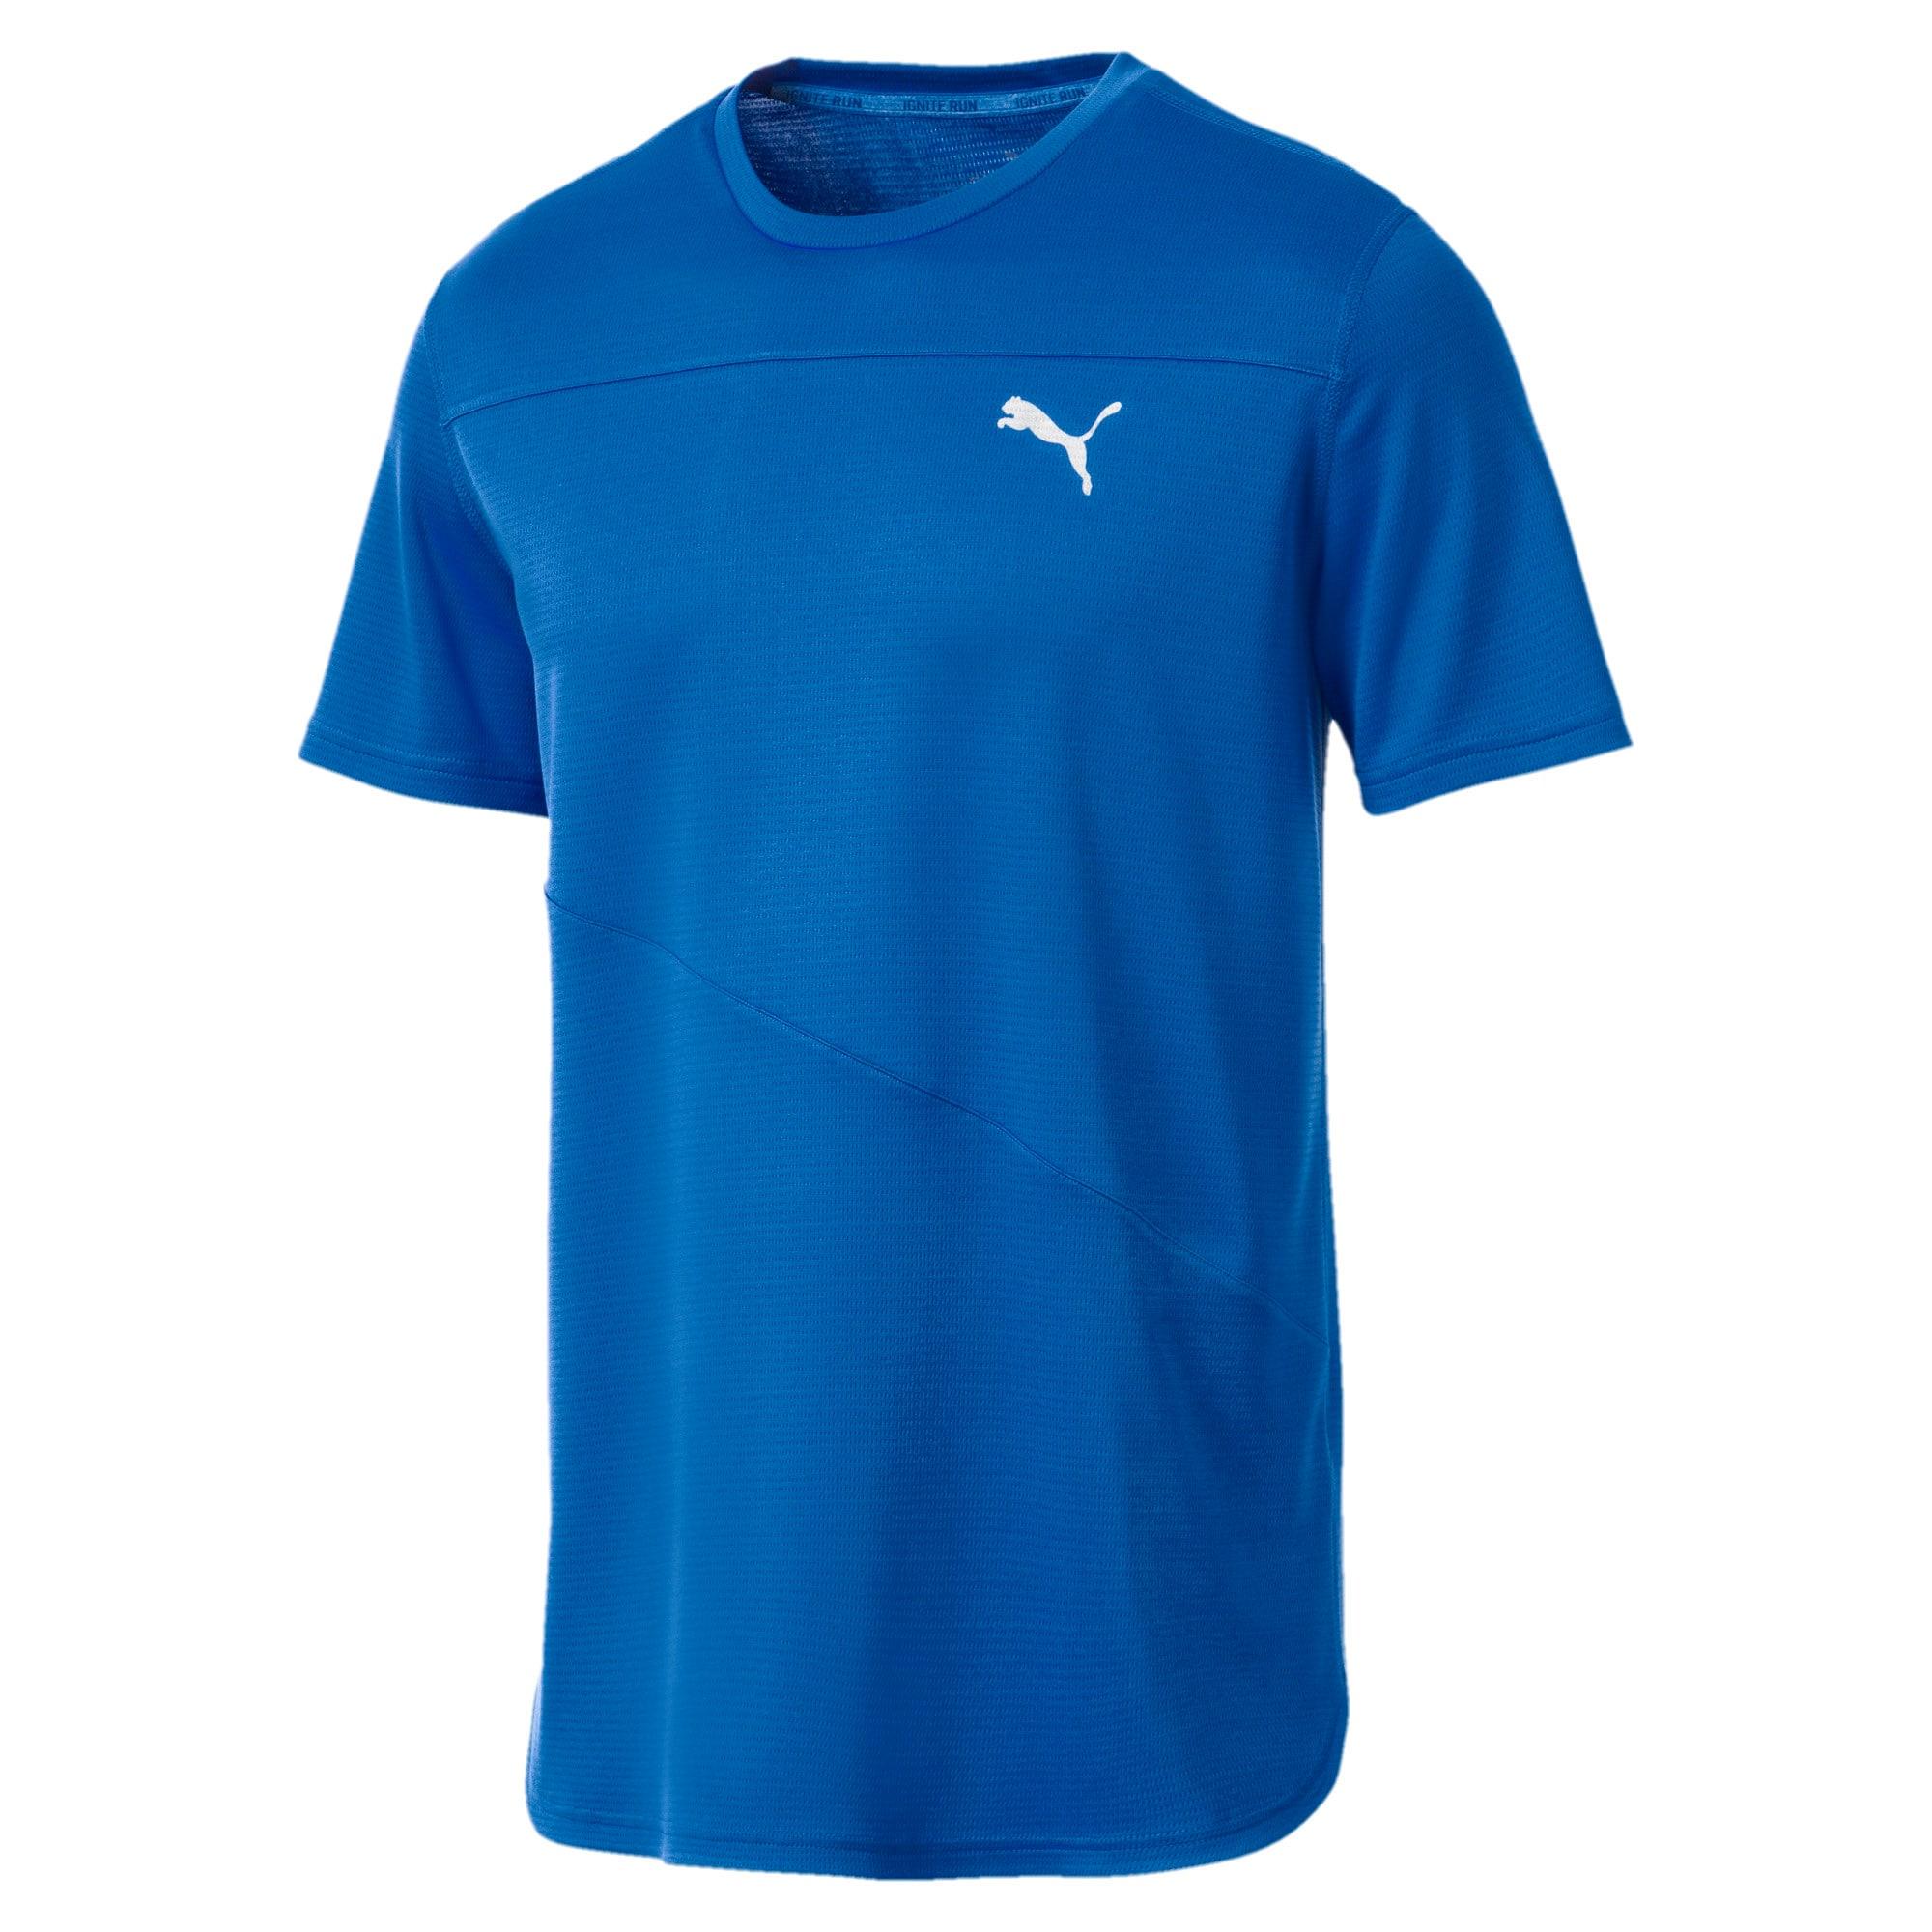 Thumbnail 4 of Running Men's IGNITE Mono T-Shirt, Strong Blue, medium-IND